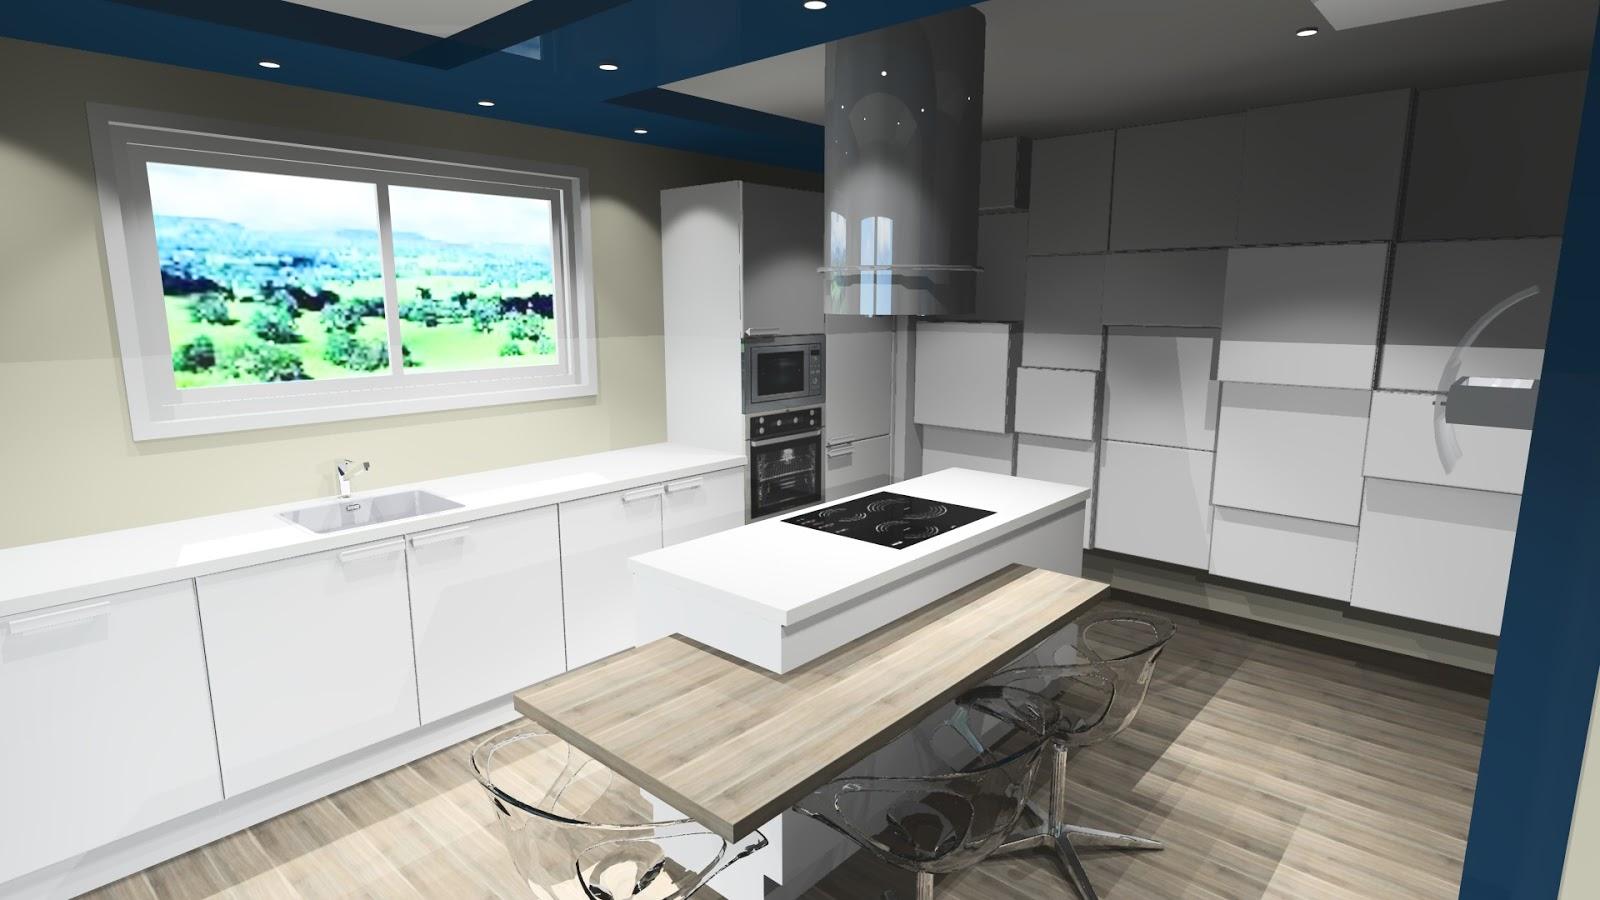 Cuisine Moderne Design Avec Ilot | Cuisine Avec Ilot Central Arrondi ...